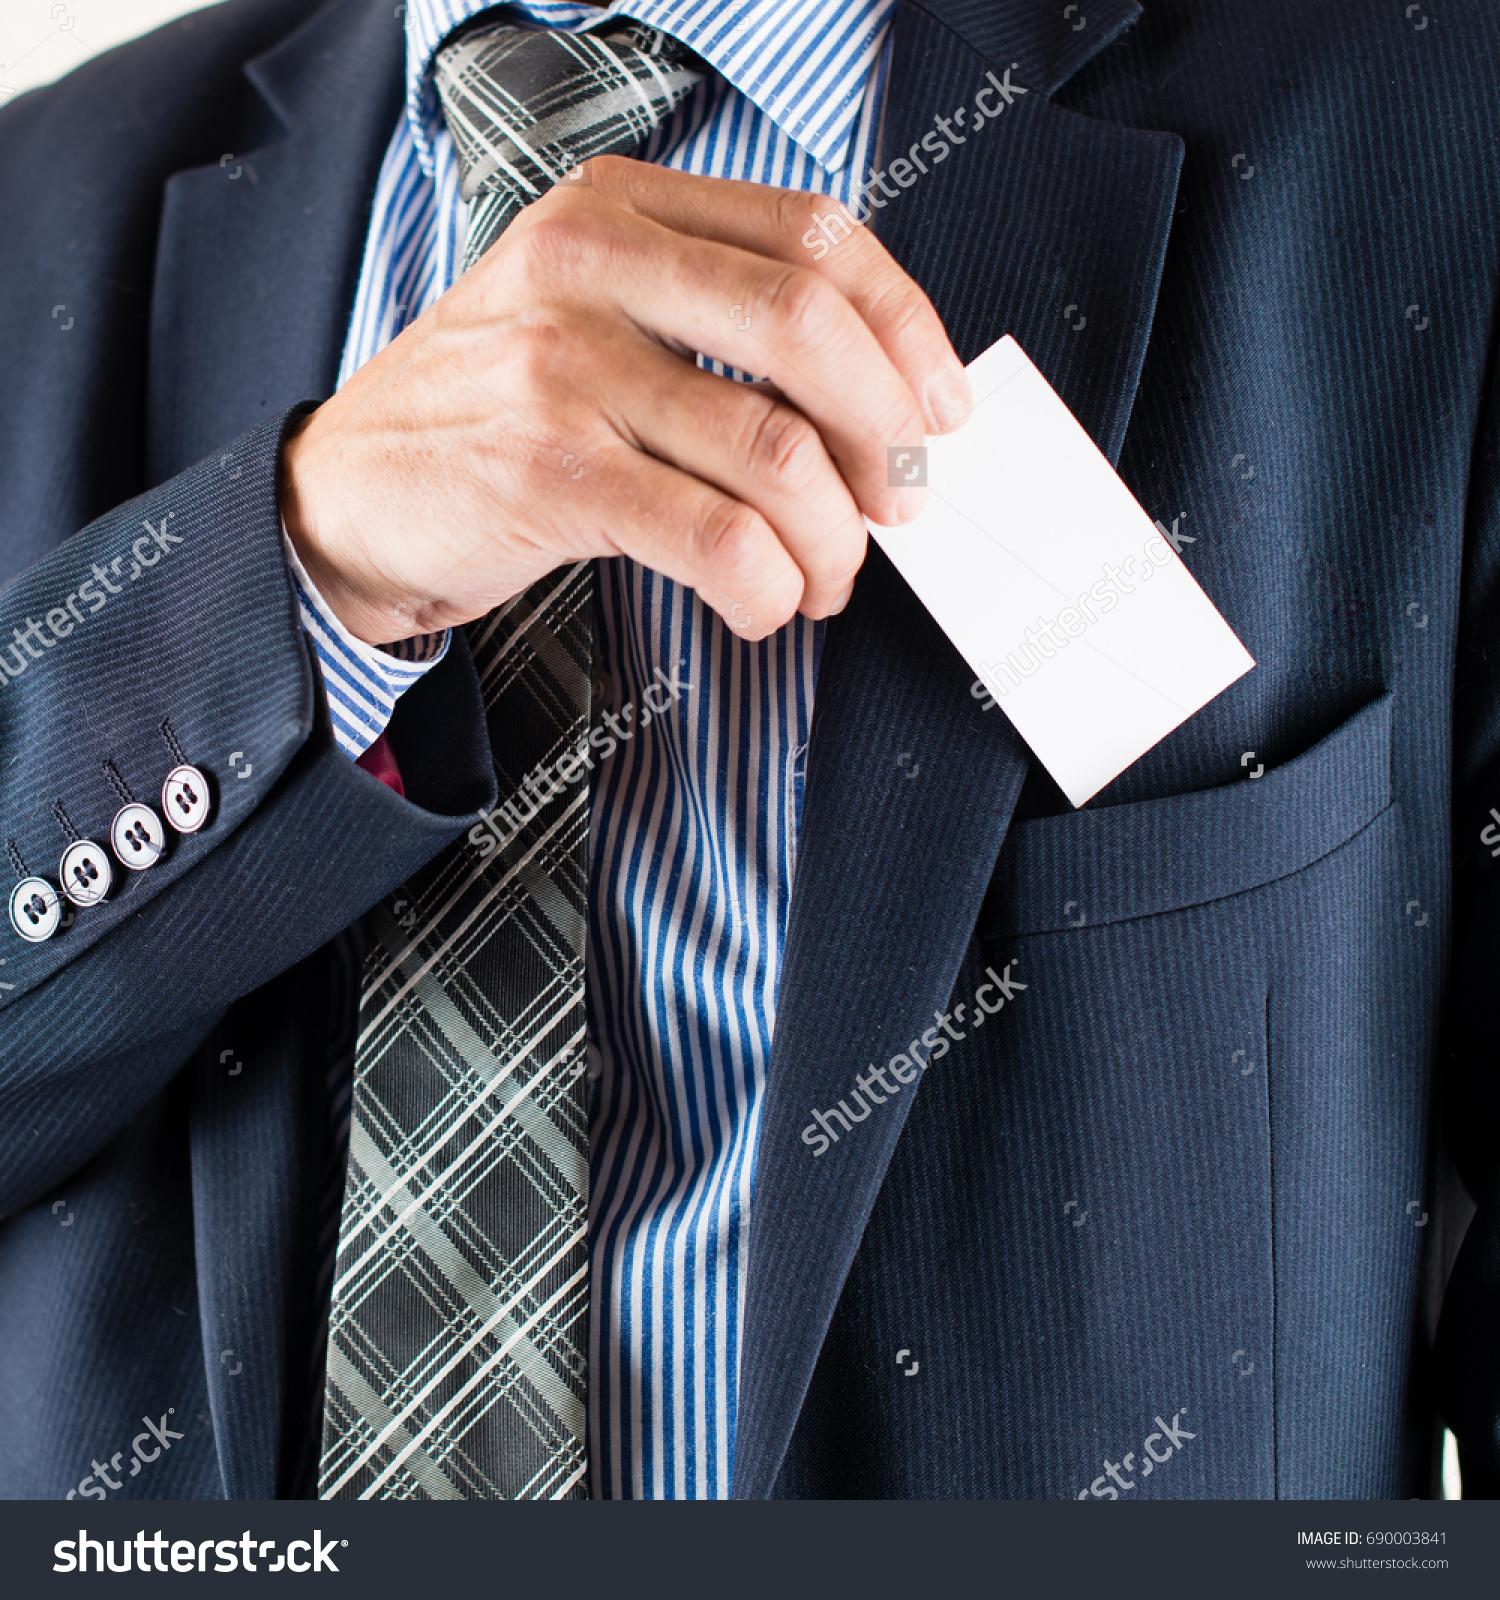 Business Man Putting Business Card Pocket Stock Photo 690003841 ...